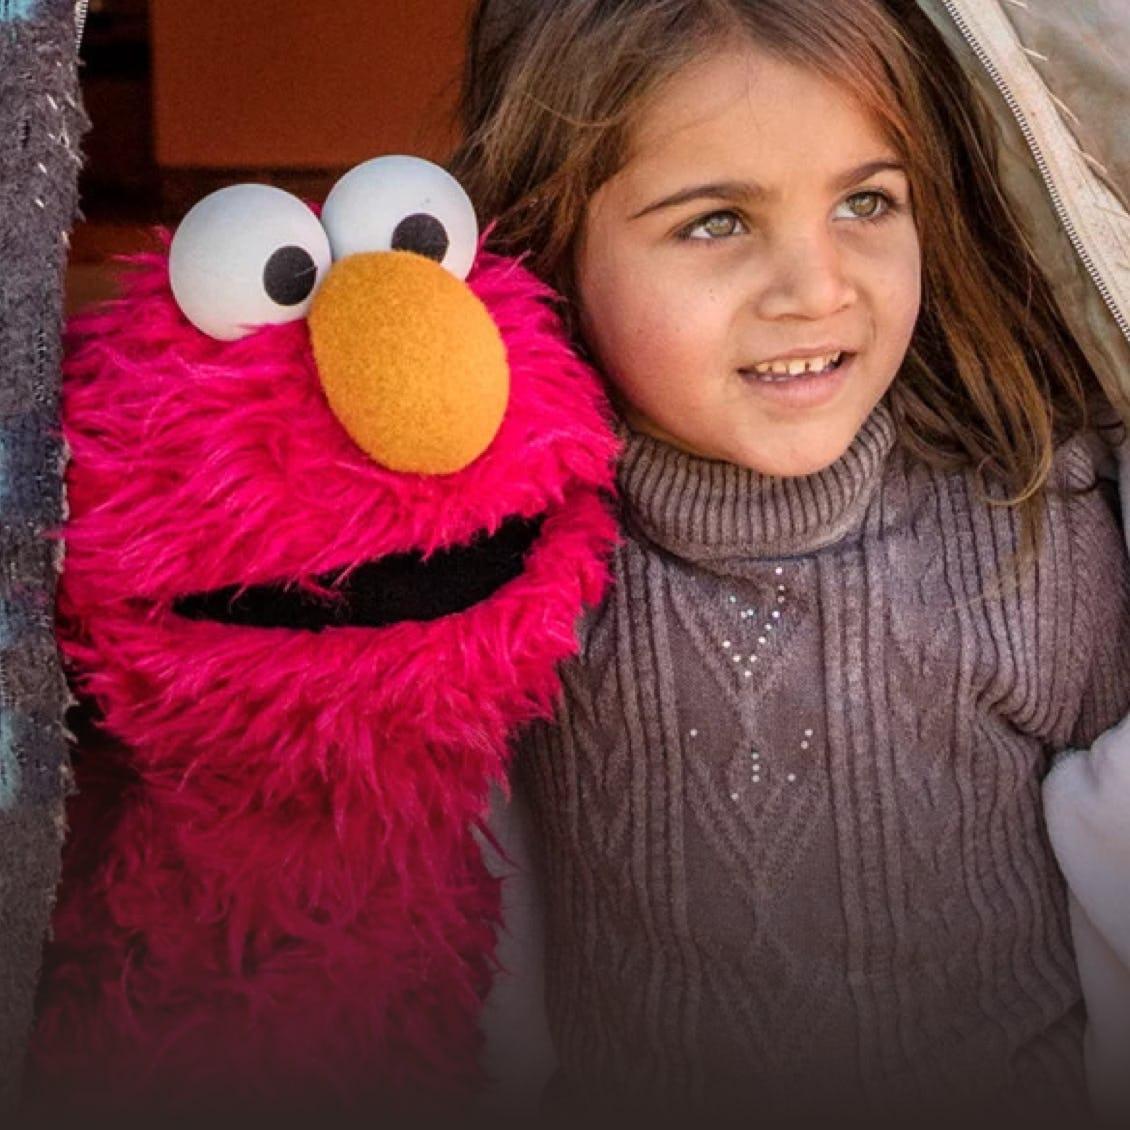 a kid hunging Elmo